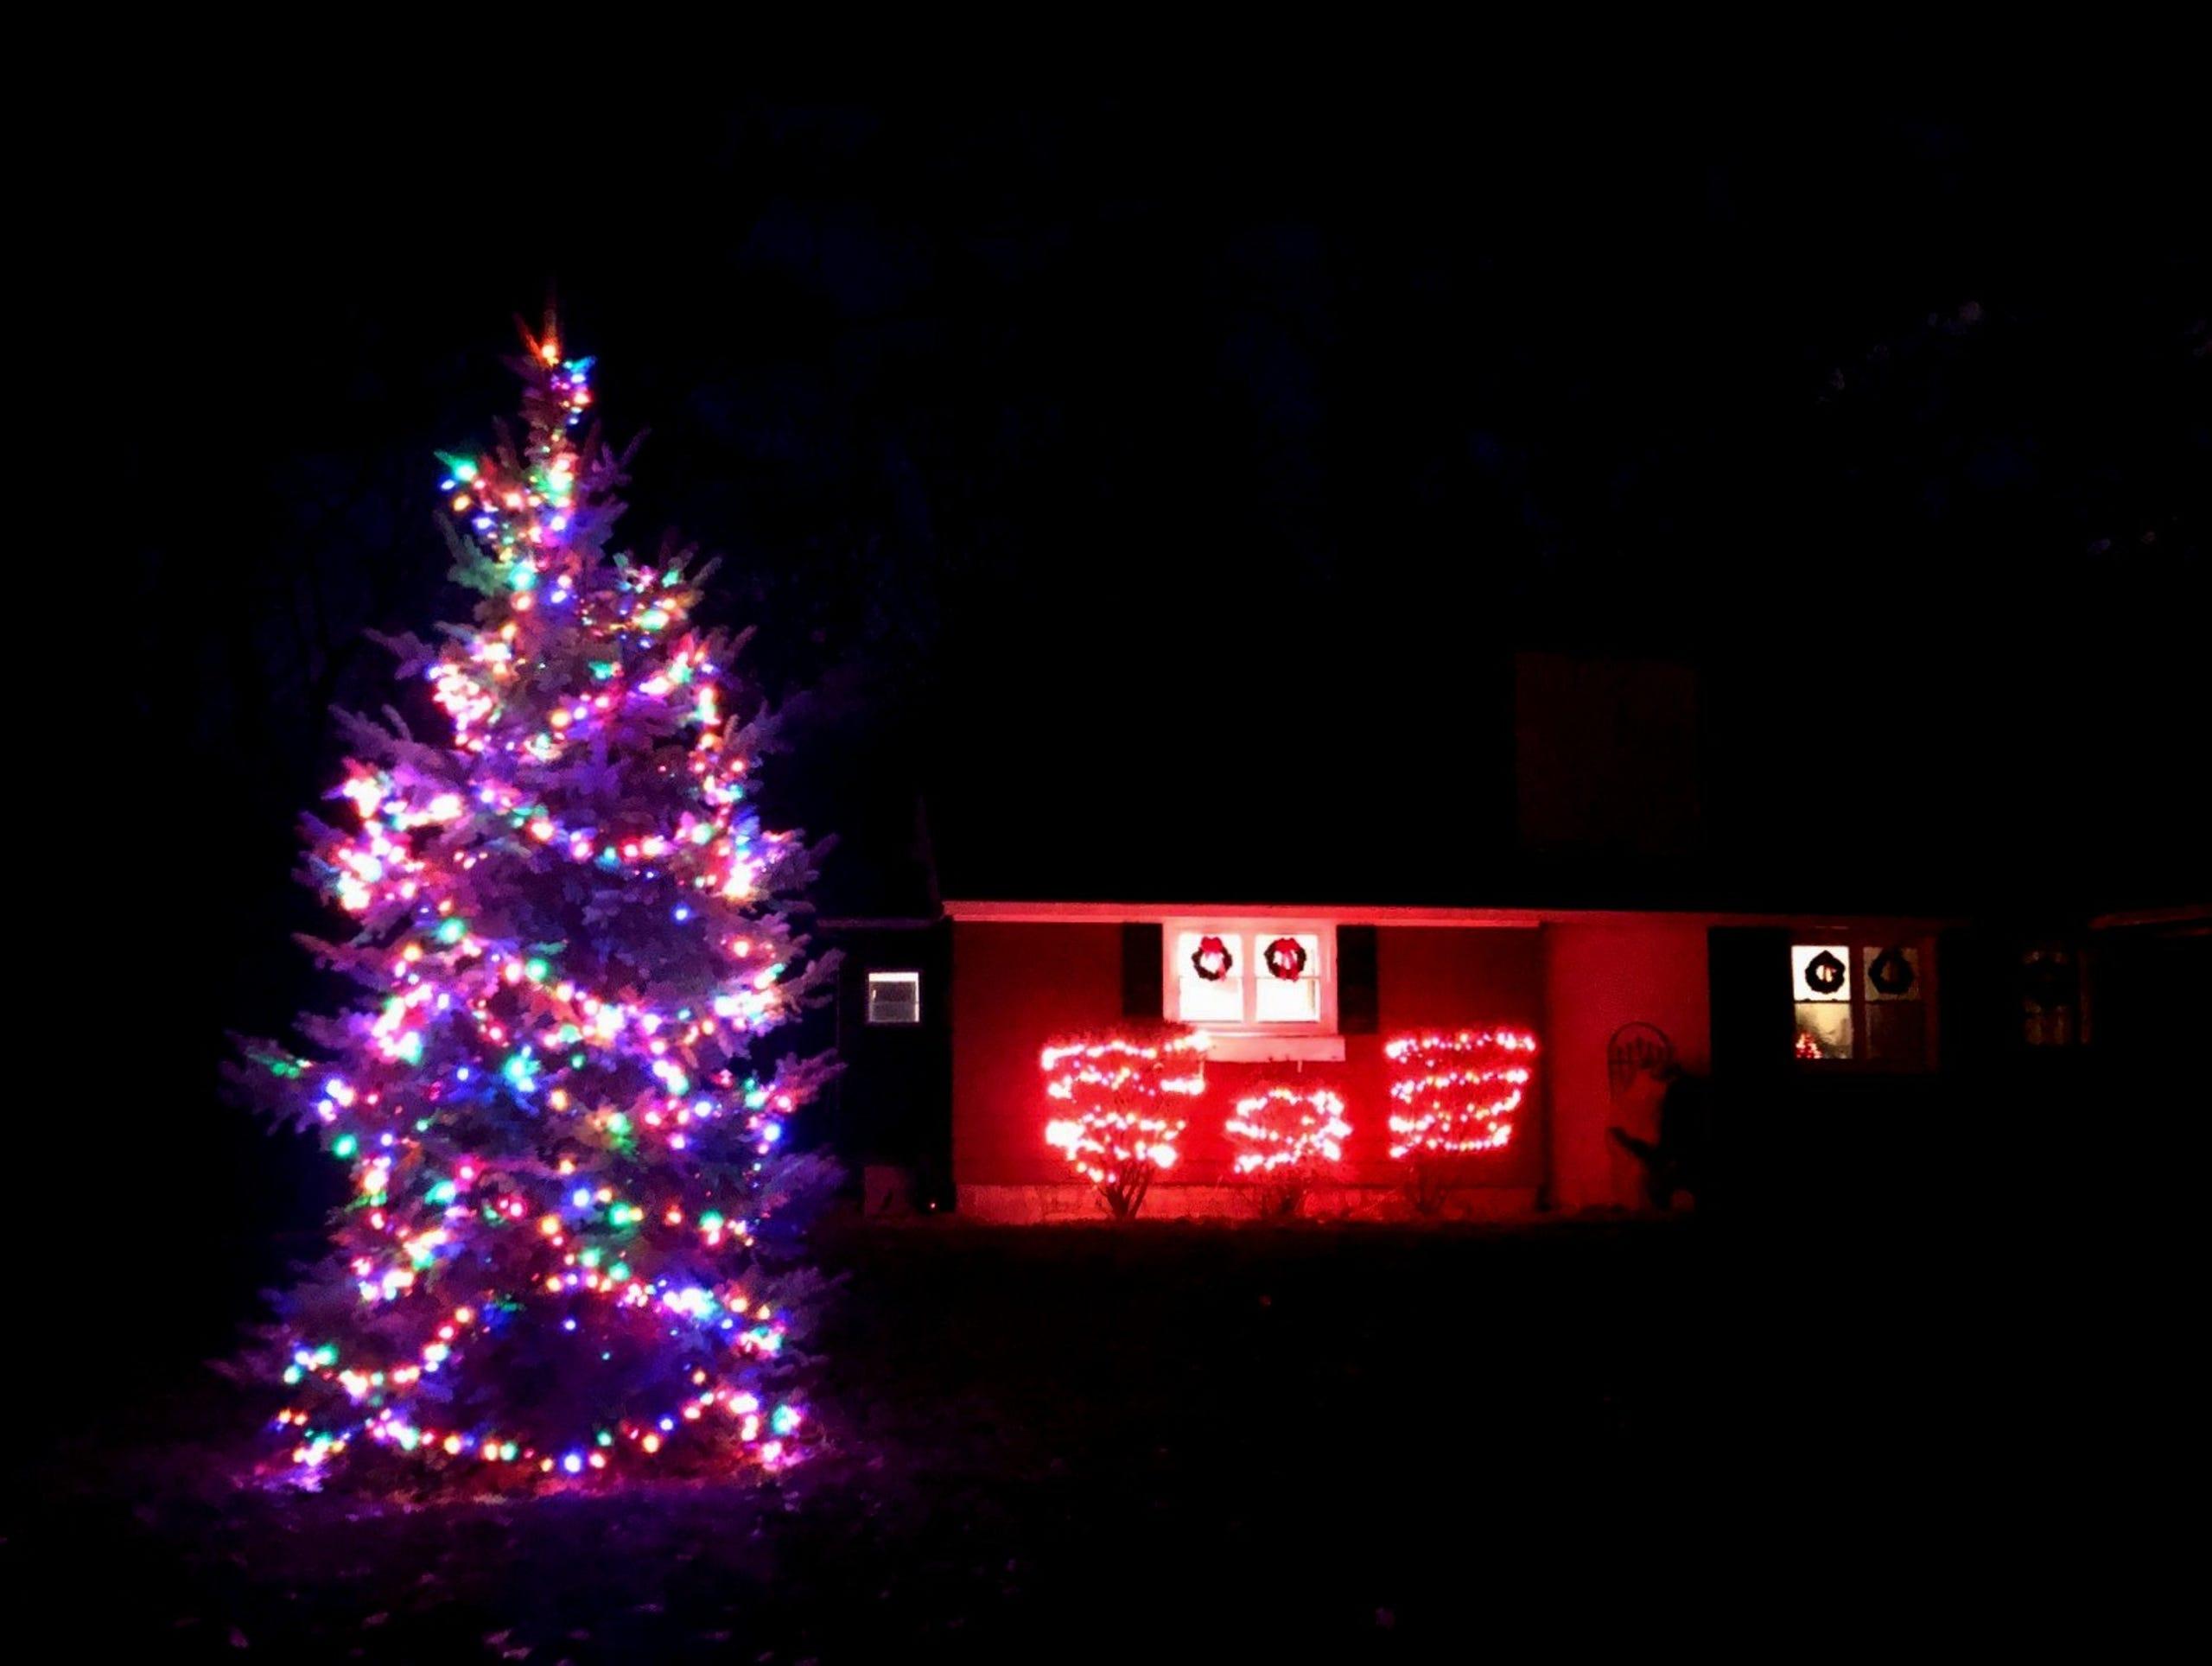 Festive lights adorn a house in South Burlington on Wednesday, Dec. 11, 2019.